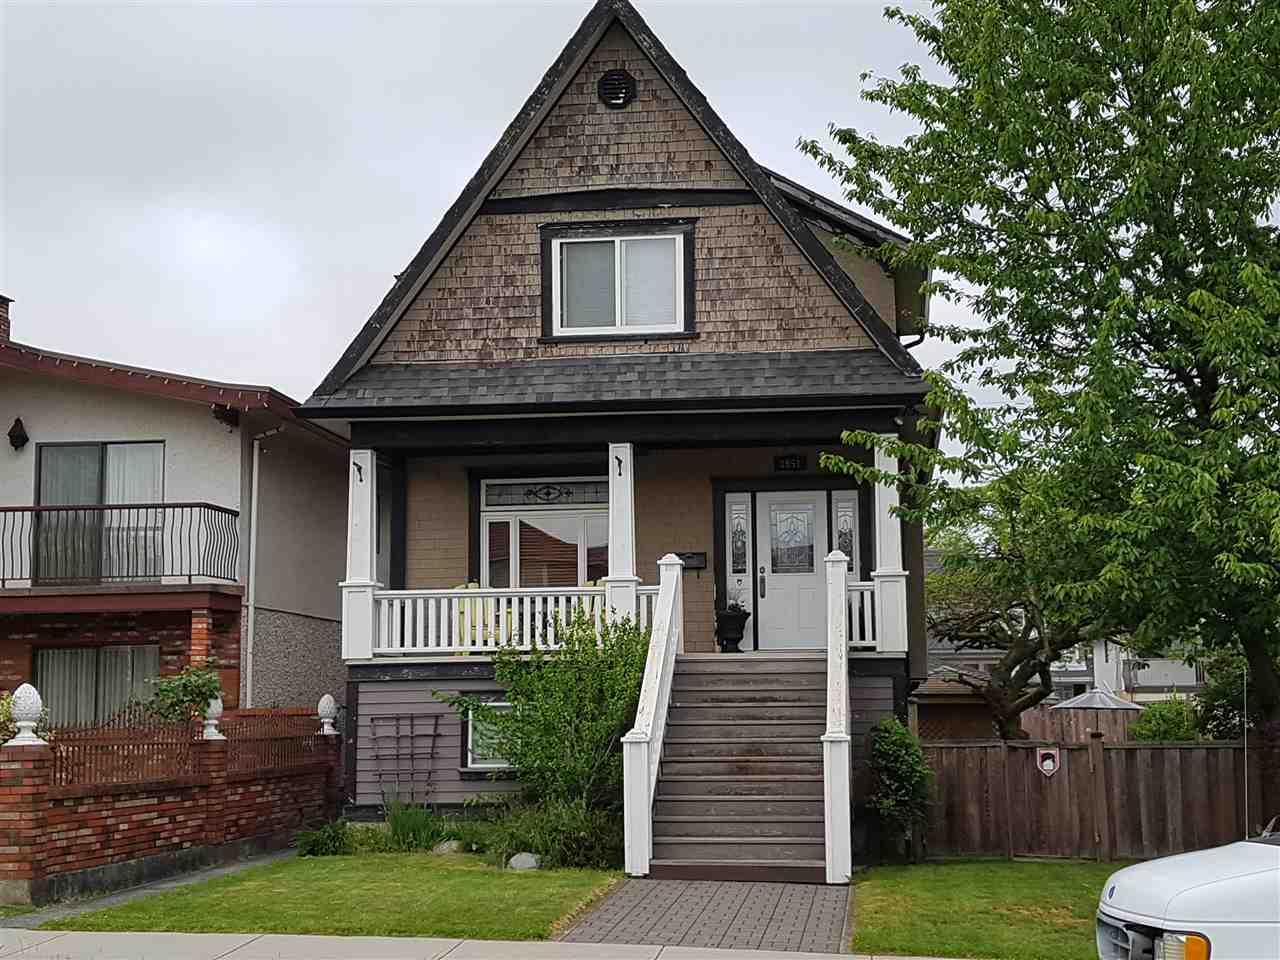 Detached at 3951 PANDORA STREET, Burnaby North, British Columbia. Image 1